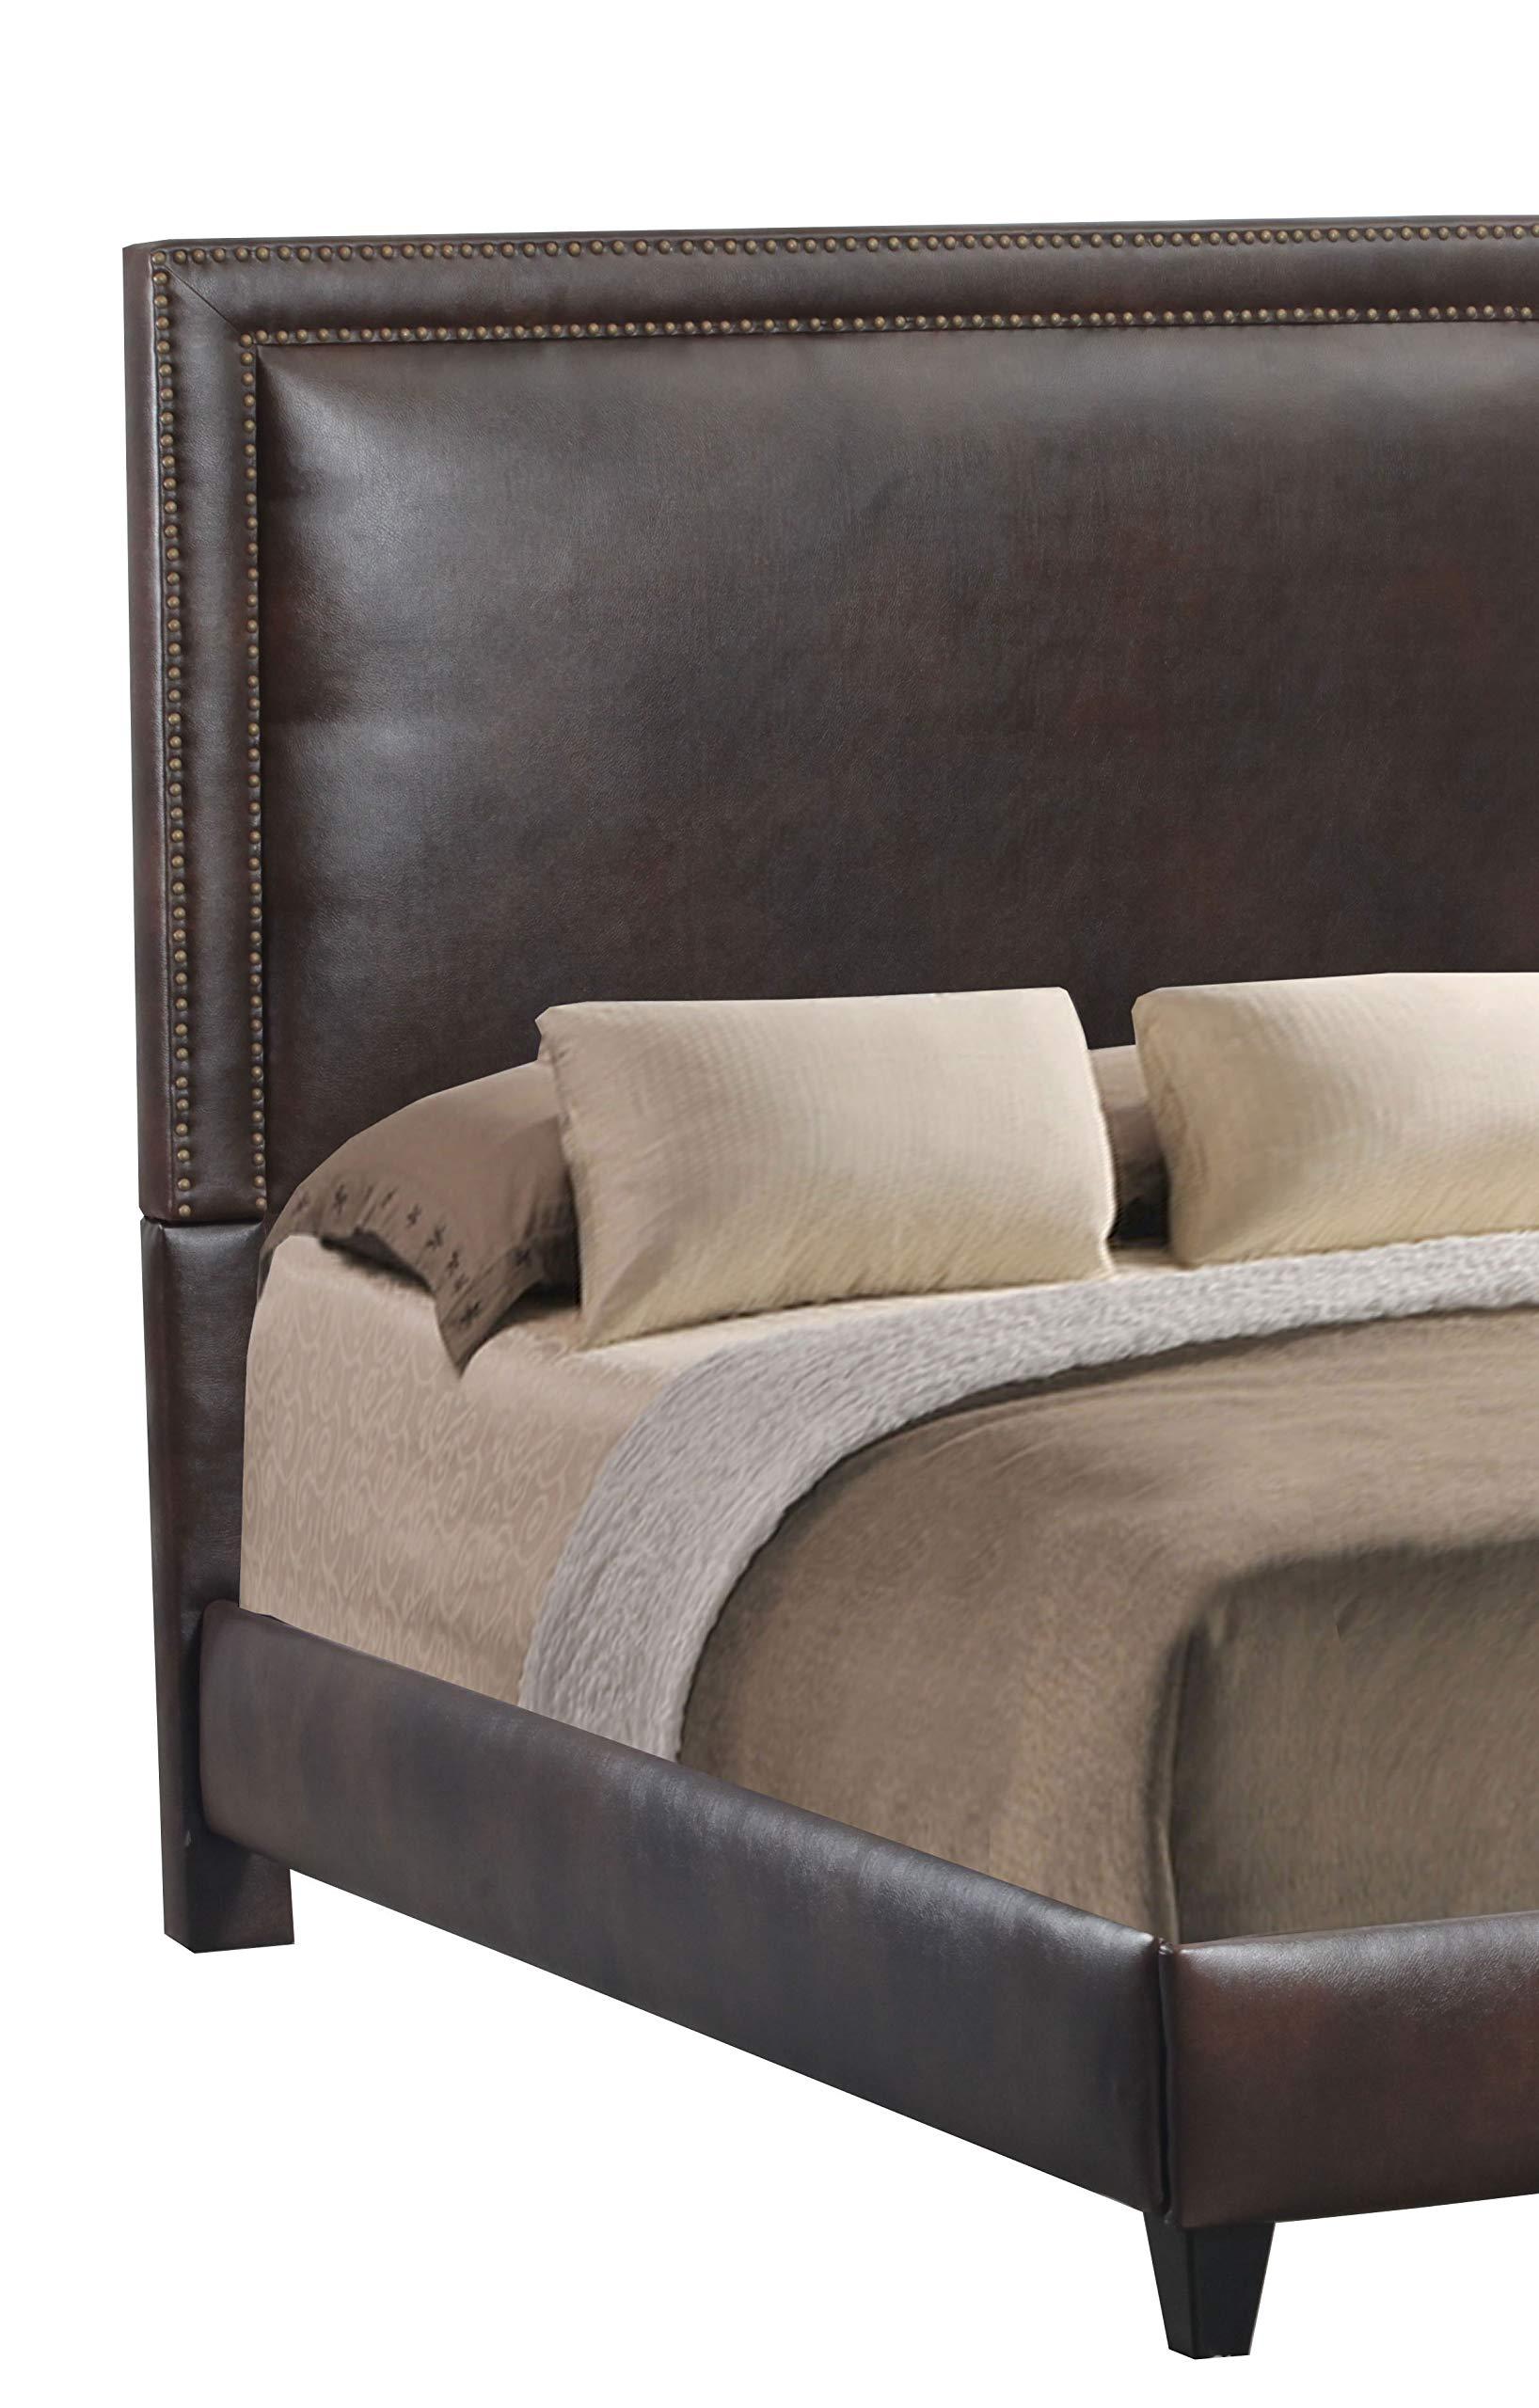 Leffler Home 17000-10-19-01 by-Cast Espresso Brookside Bed Rails and Footboard, King, Dark Brown by Leffler Home